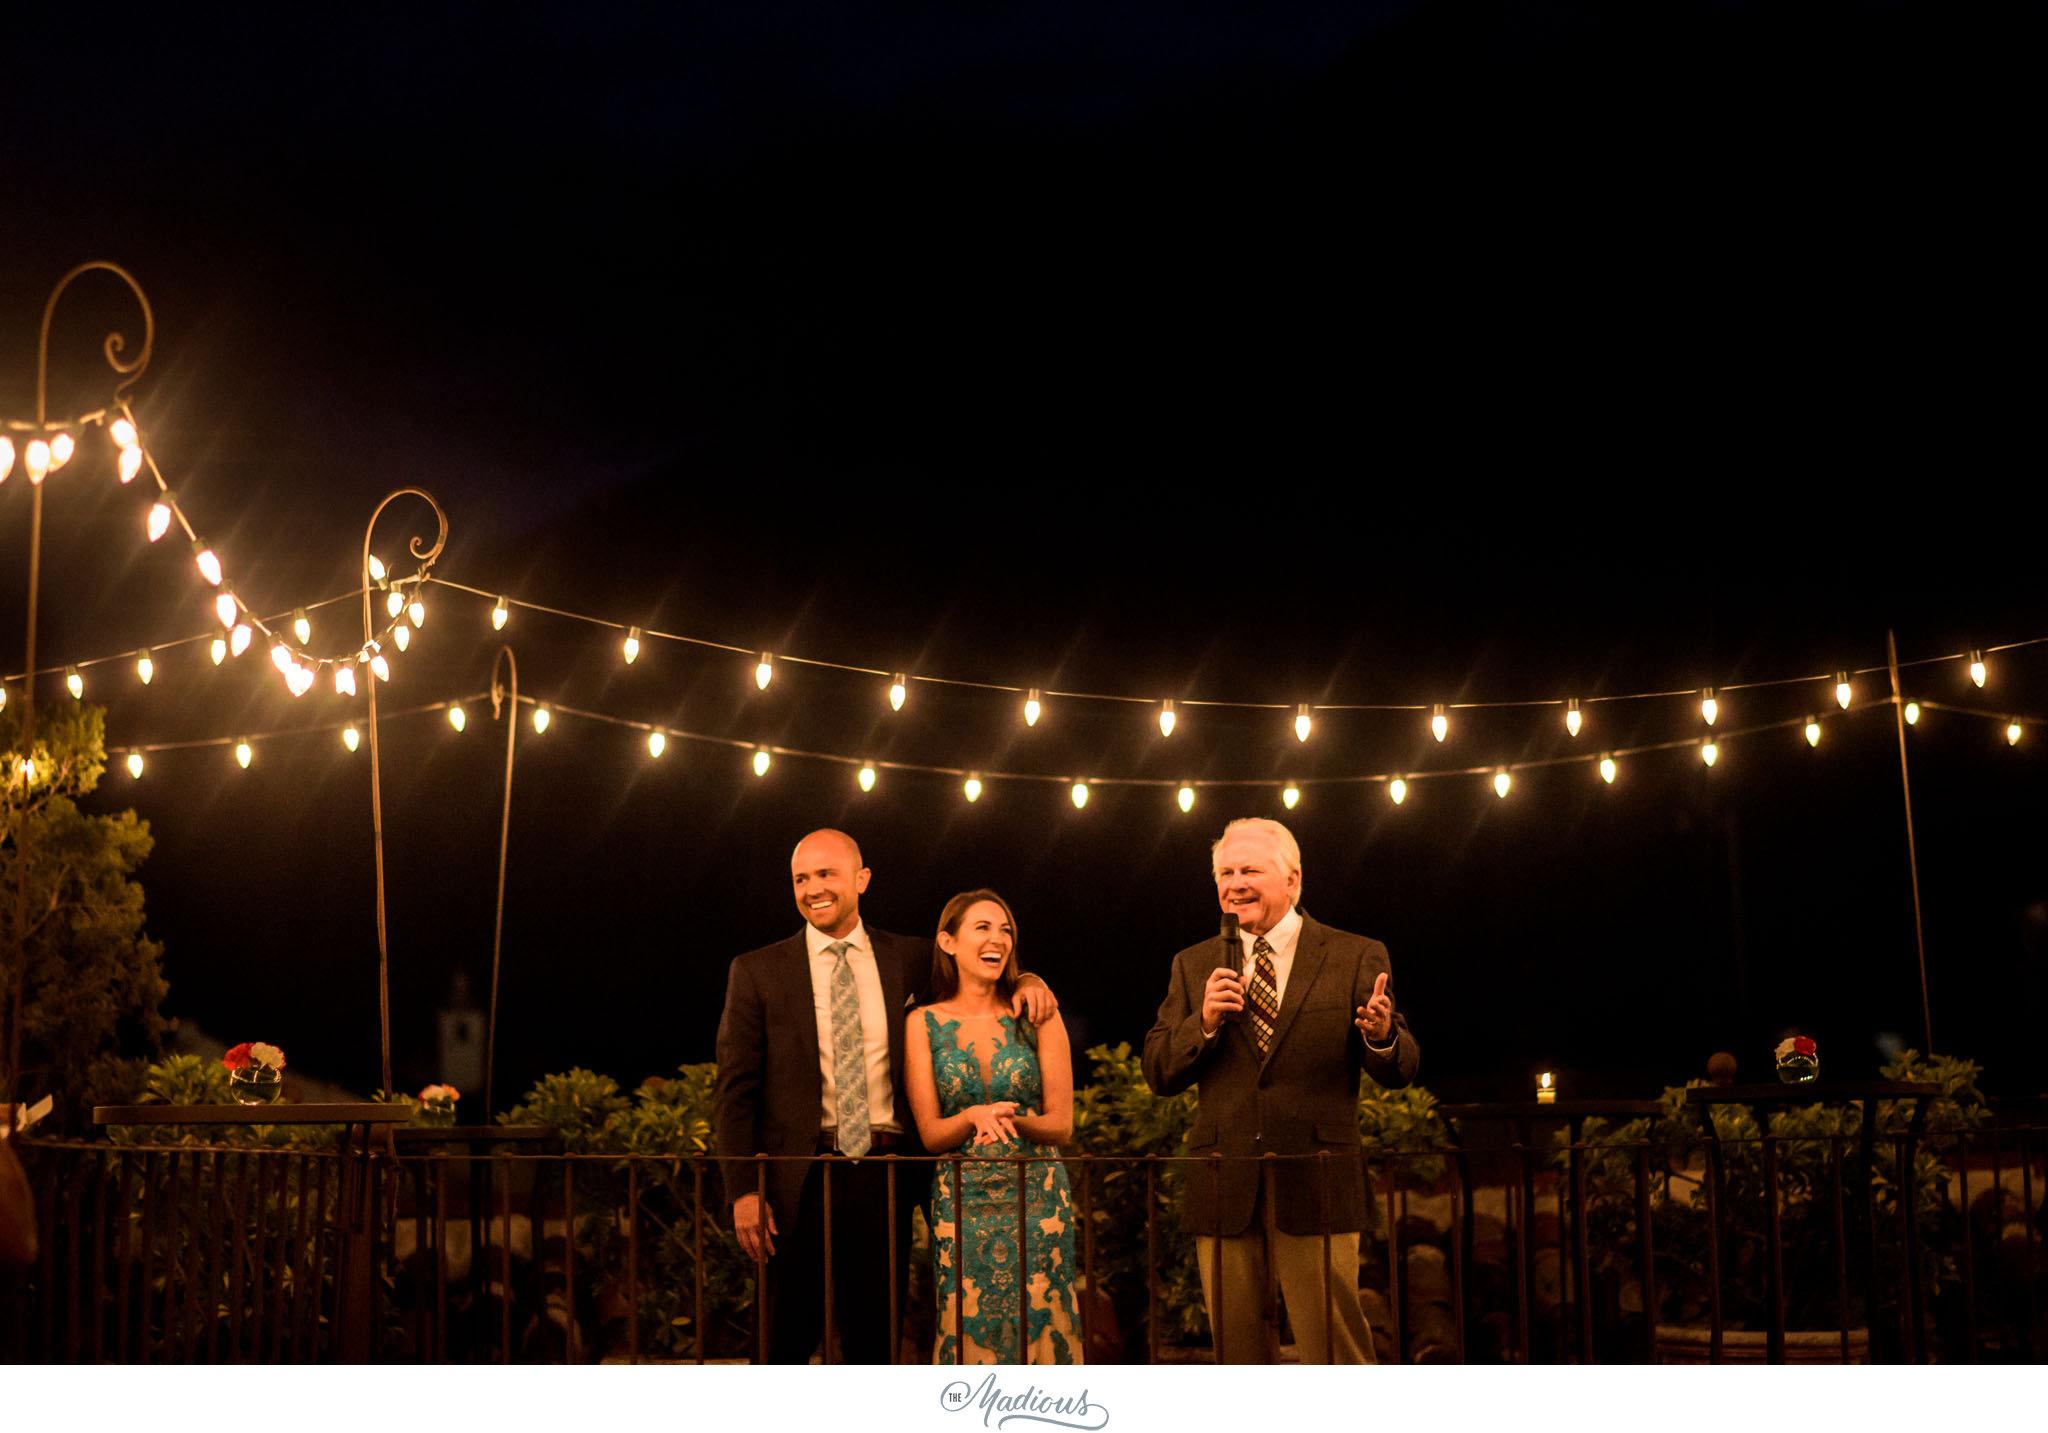 Leigh_Rob_Antigua_Guatemala_Santa_Clara_Destination_Wedding_15.JPG